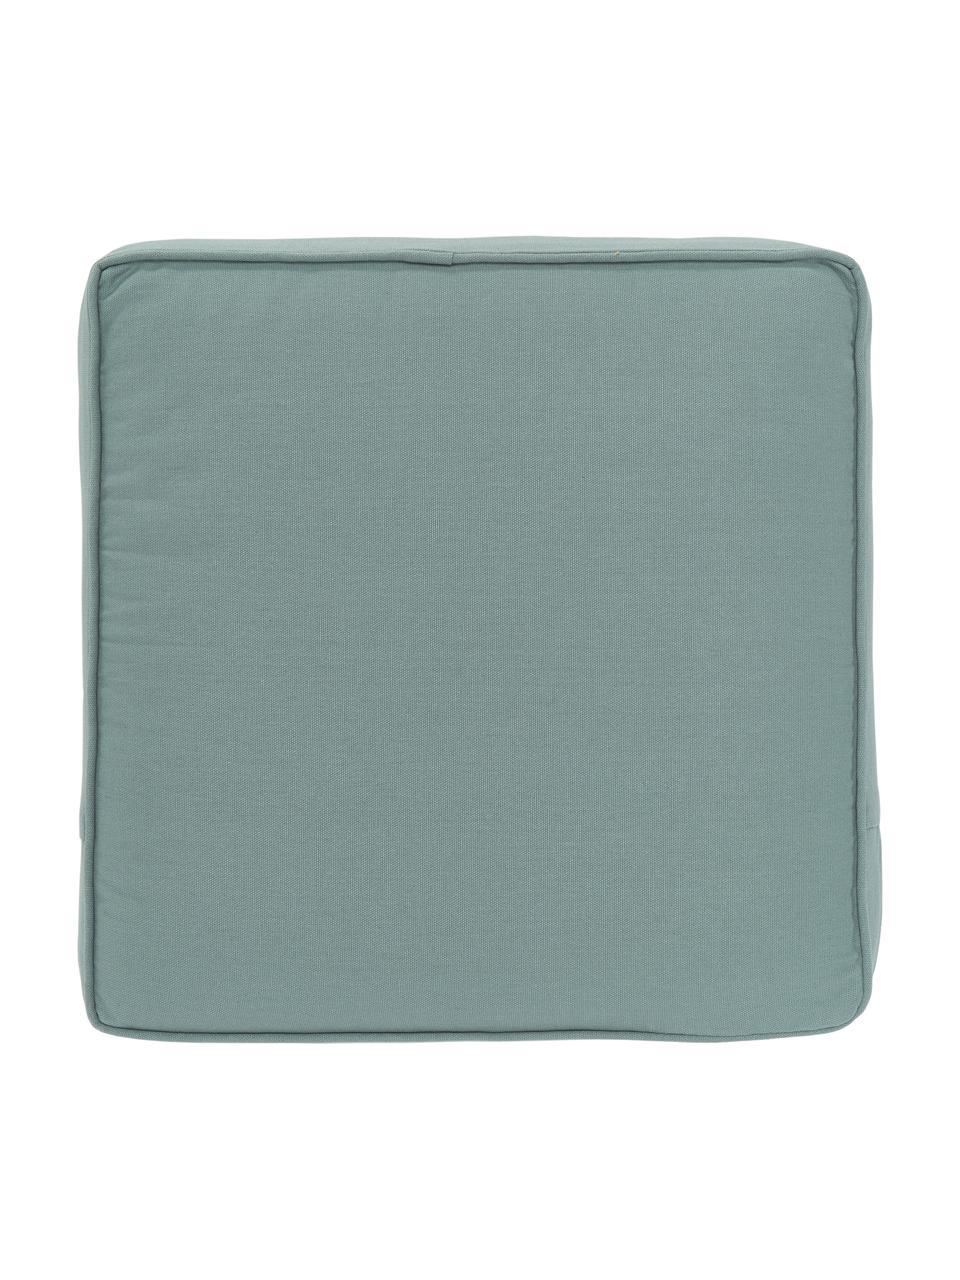 Cuscino sedia alto verde salvia Zoey, Rivestimento: 100% cotone, Verde, Larg. 40 x Lung. 40 cm